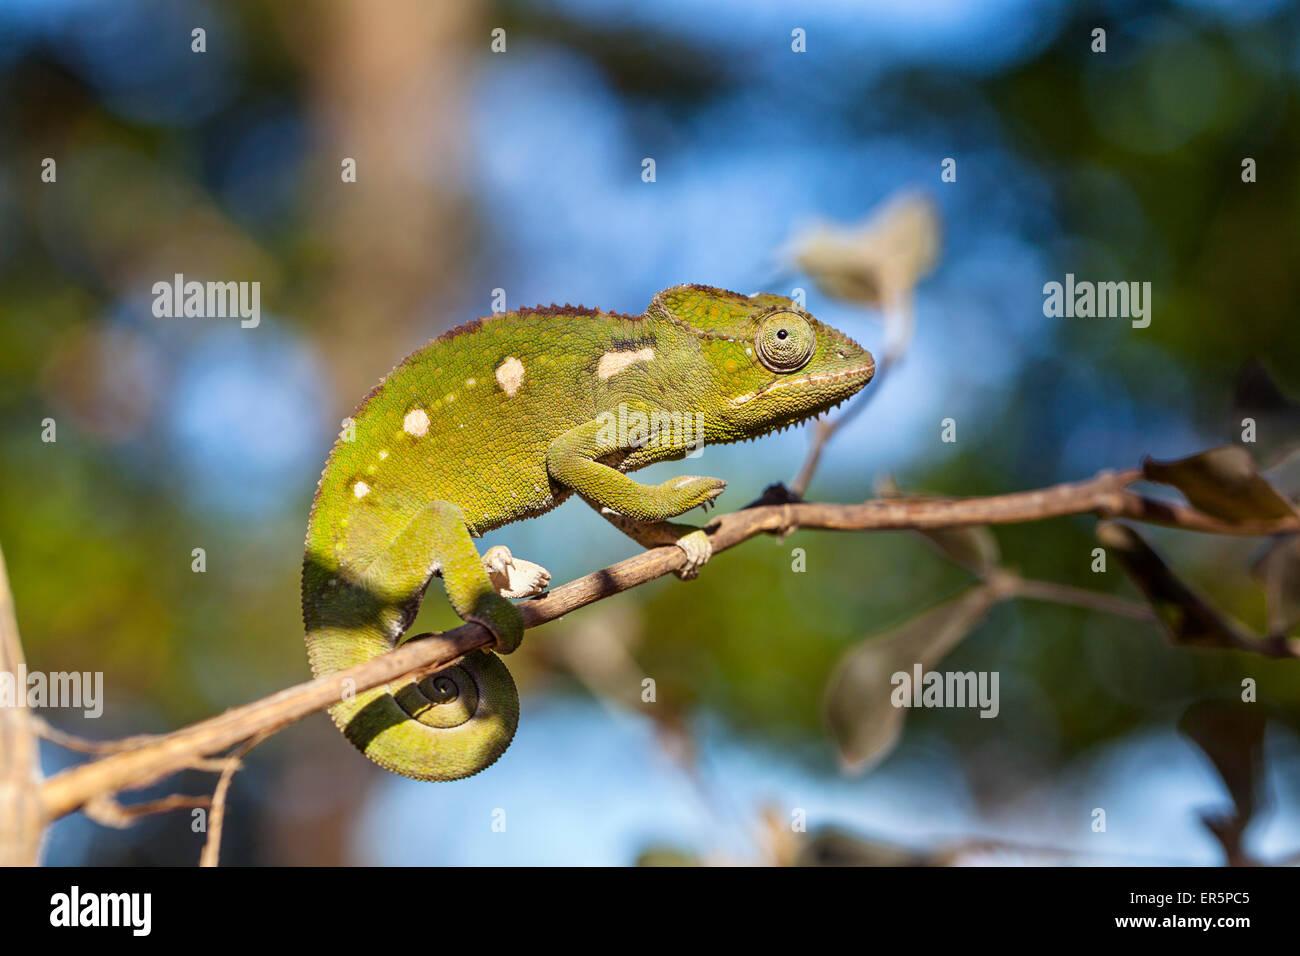 Warzige Chamäleon, Furcifer Verrucosus, Isalo Nationalpark, Madagaskar, Afrika Stockbild